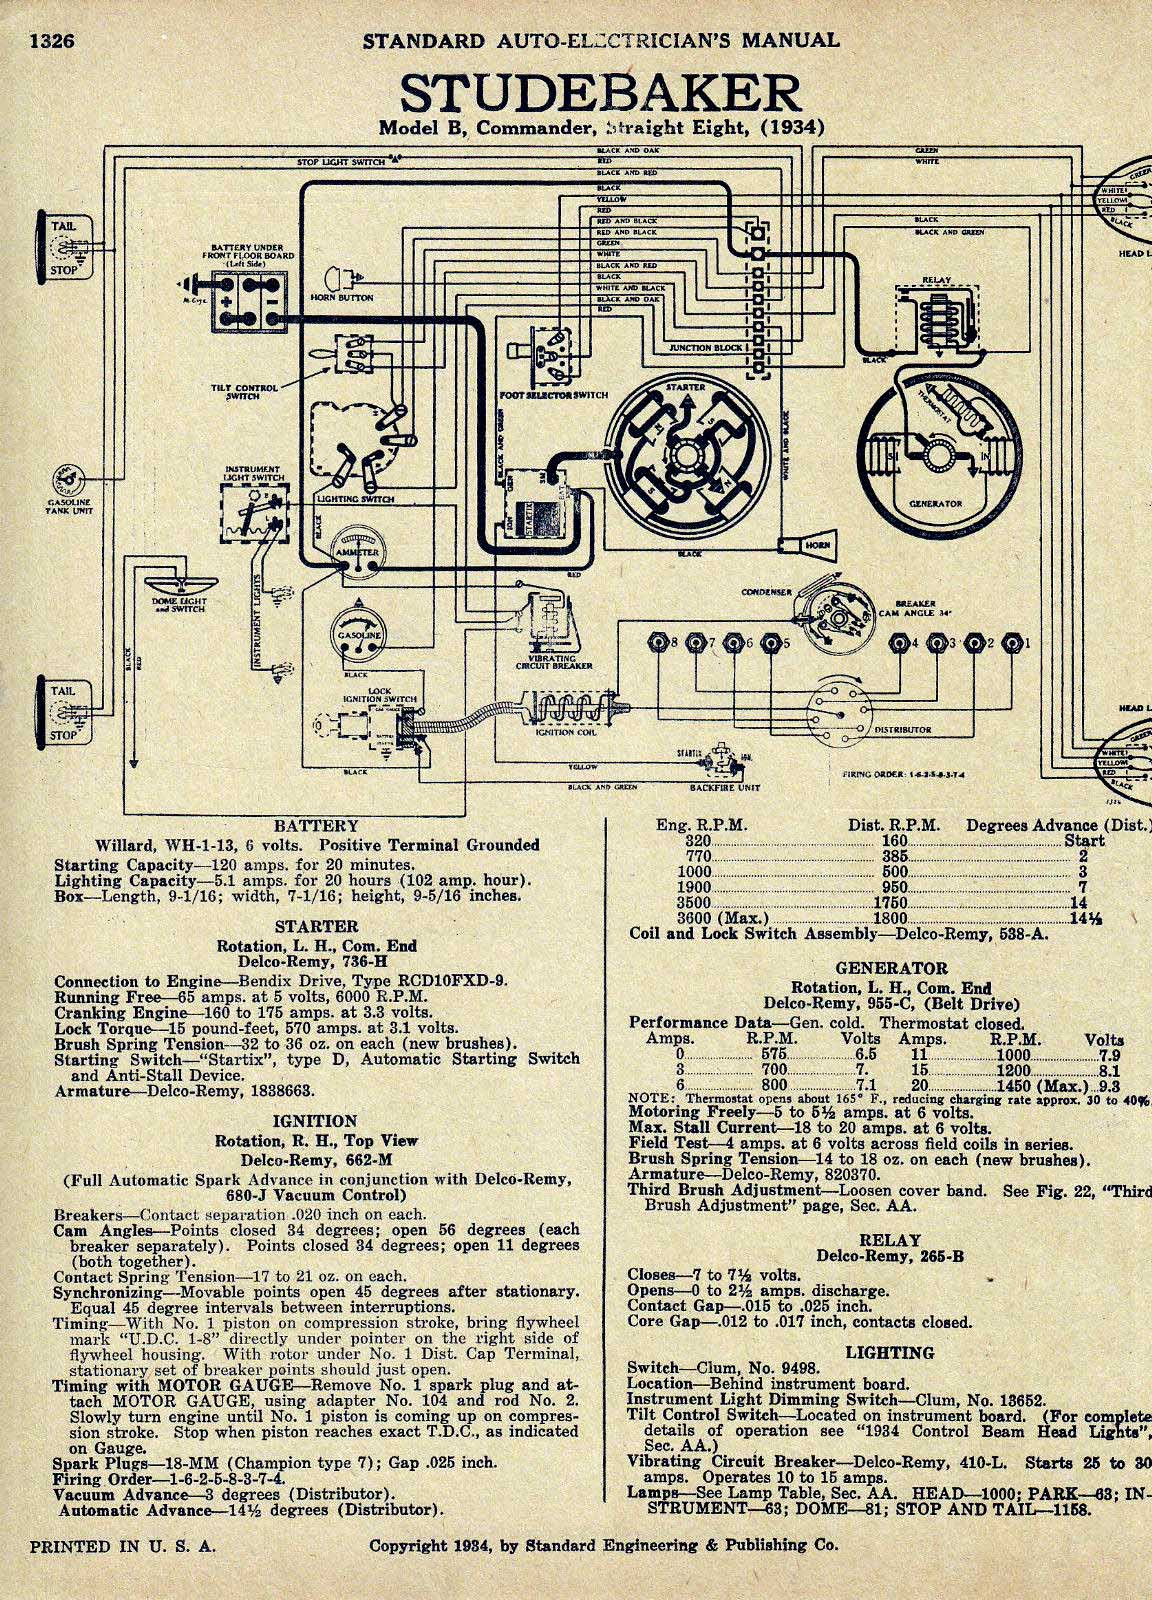 Ford 1959 Ignition Wiring Bob Johnstones Studebaker Resource Website Old